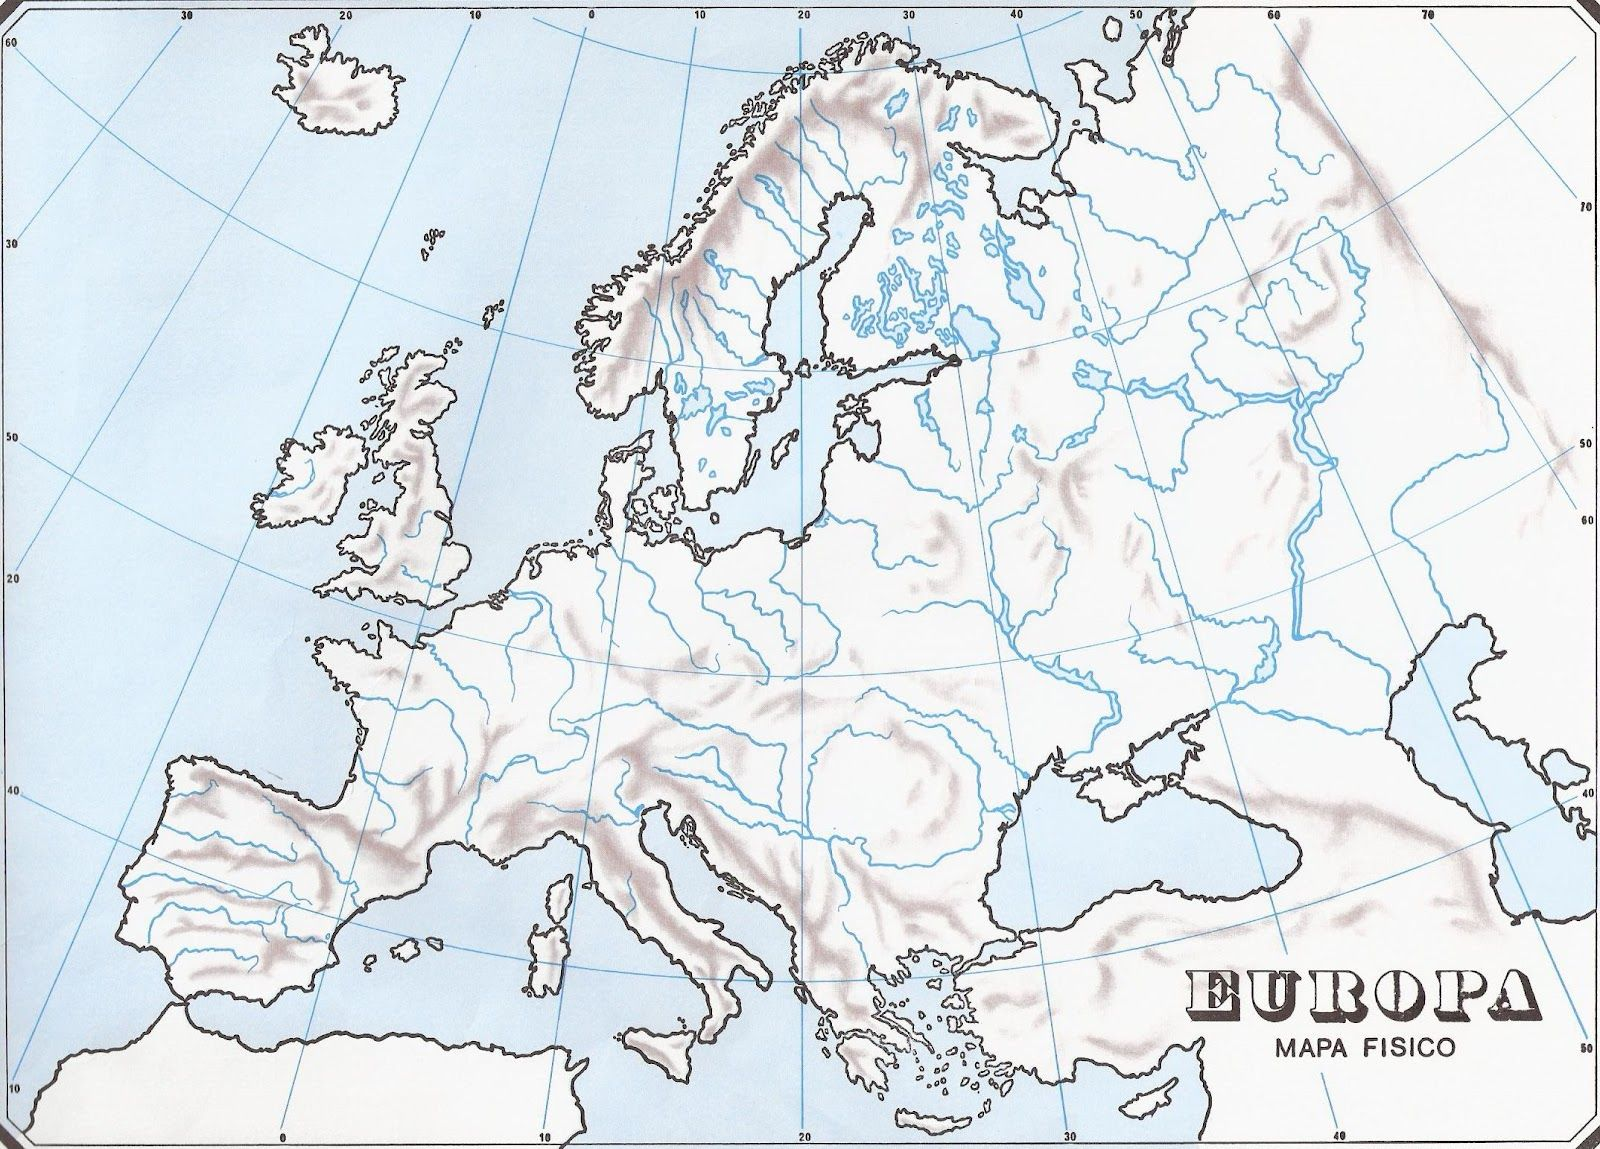 Mapa Mudo Fisico Europa Para Imprimir A4.Pin En Ciencias Sociales